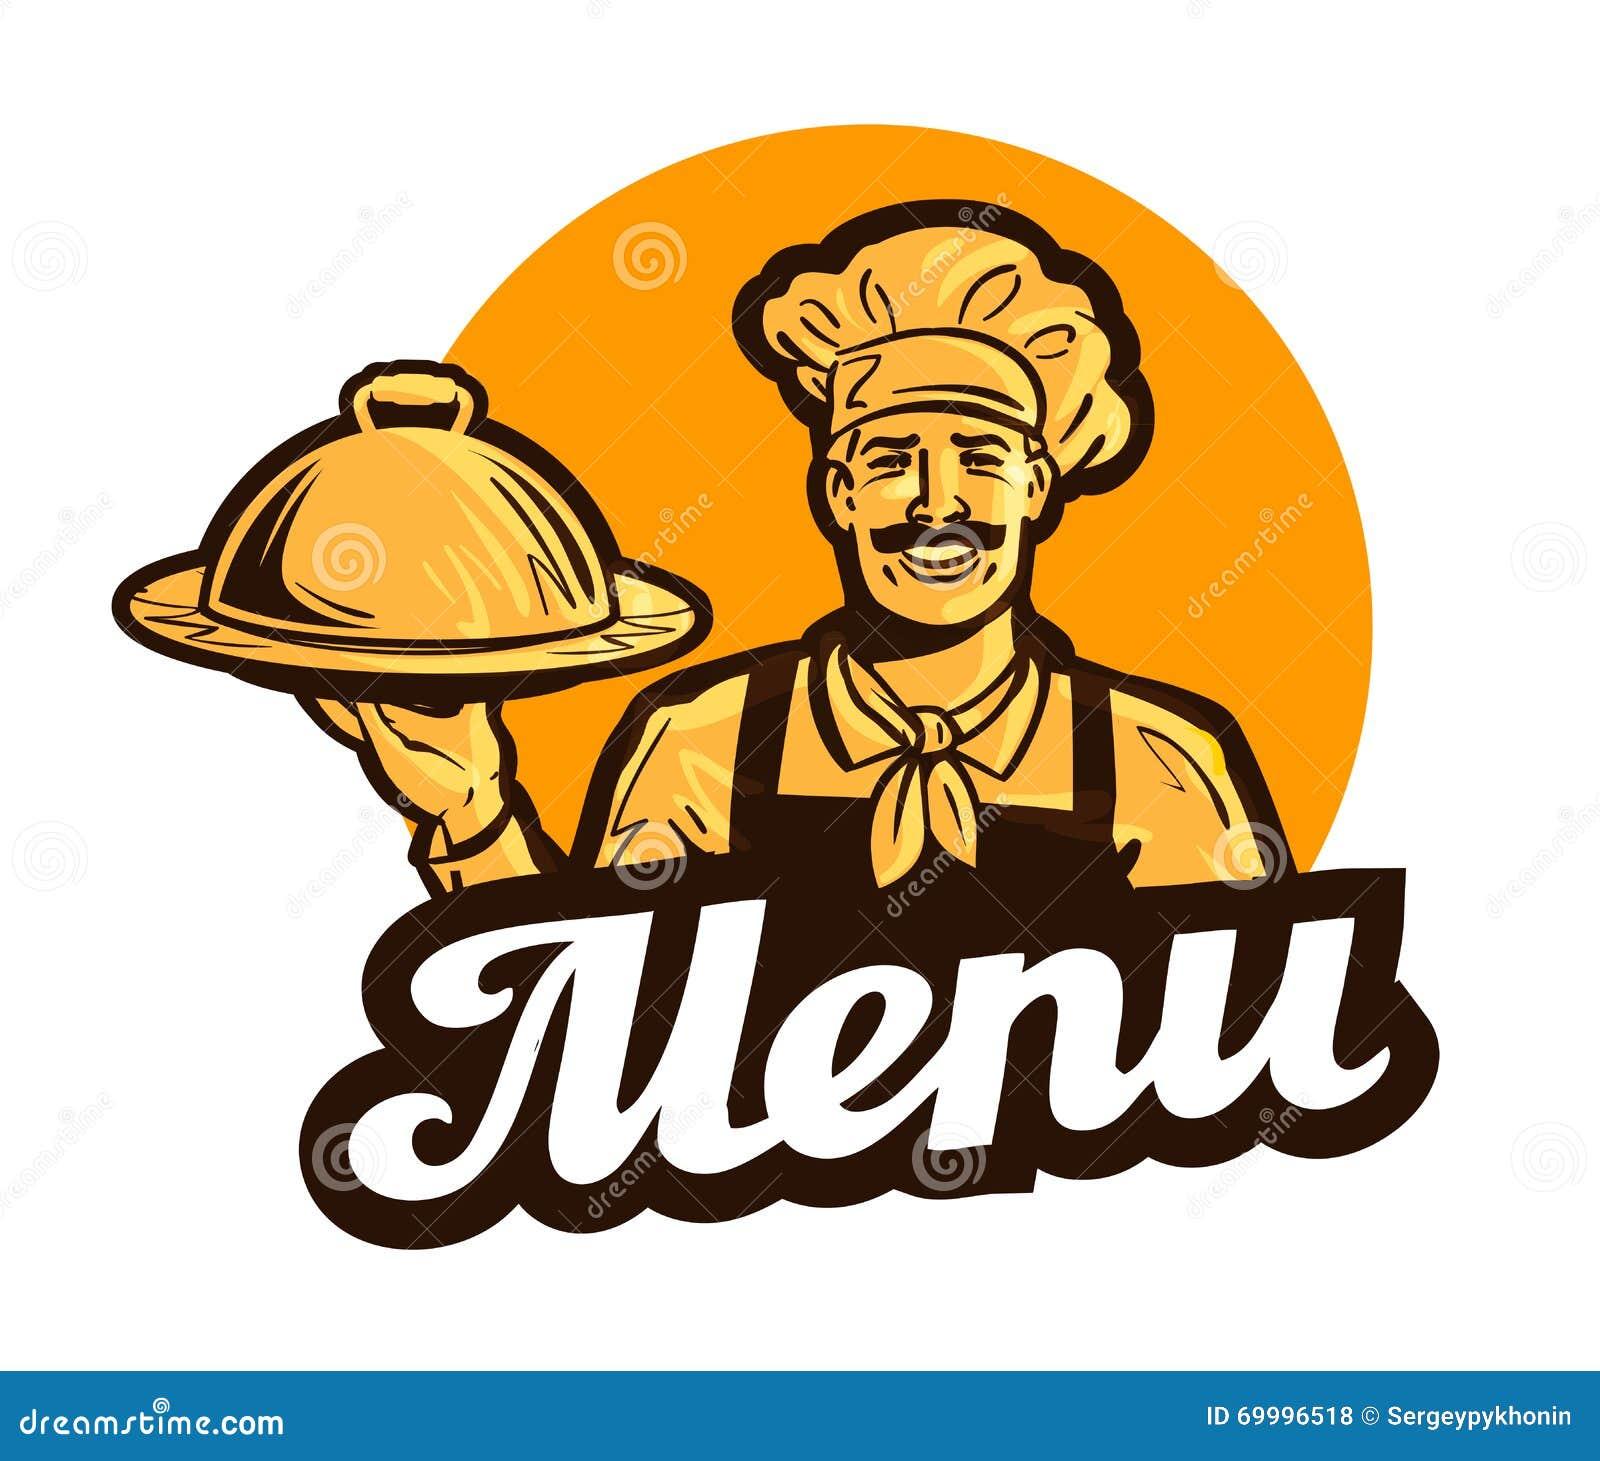 restaurant  logo de vecteur de caf u00e9 menu  plat  nourriture Cartoon Plateau plateau landform clipart